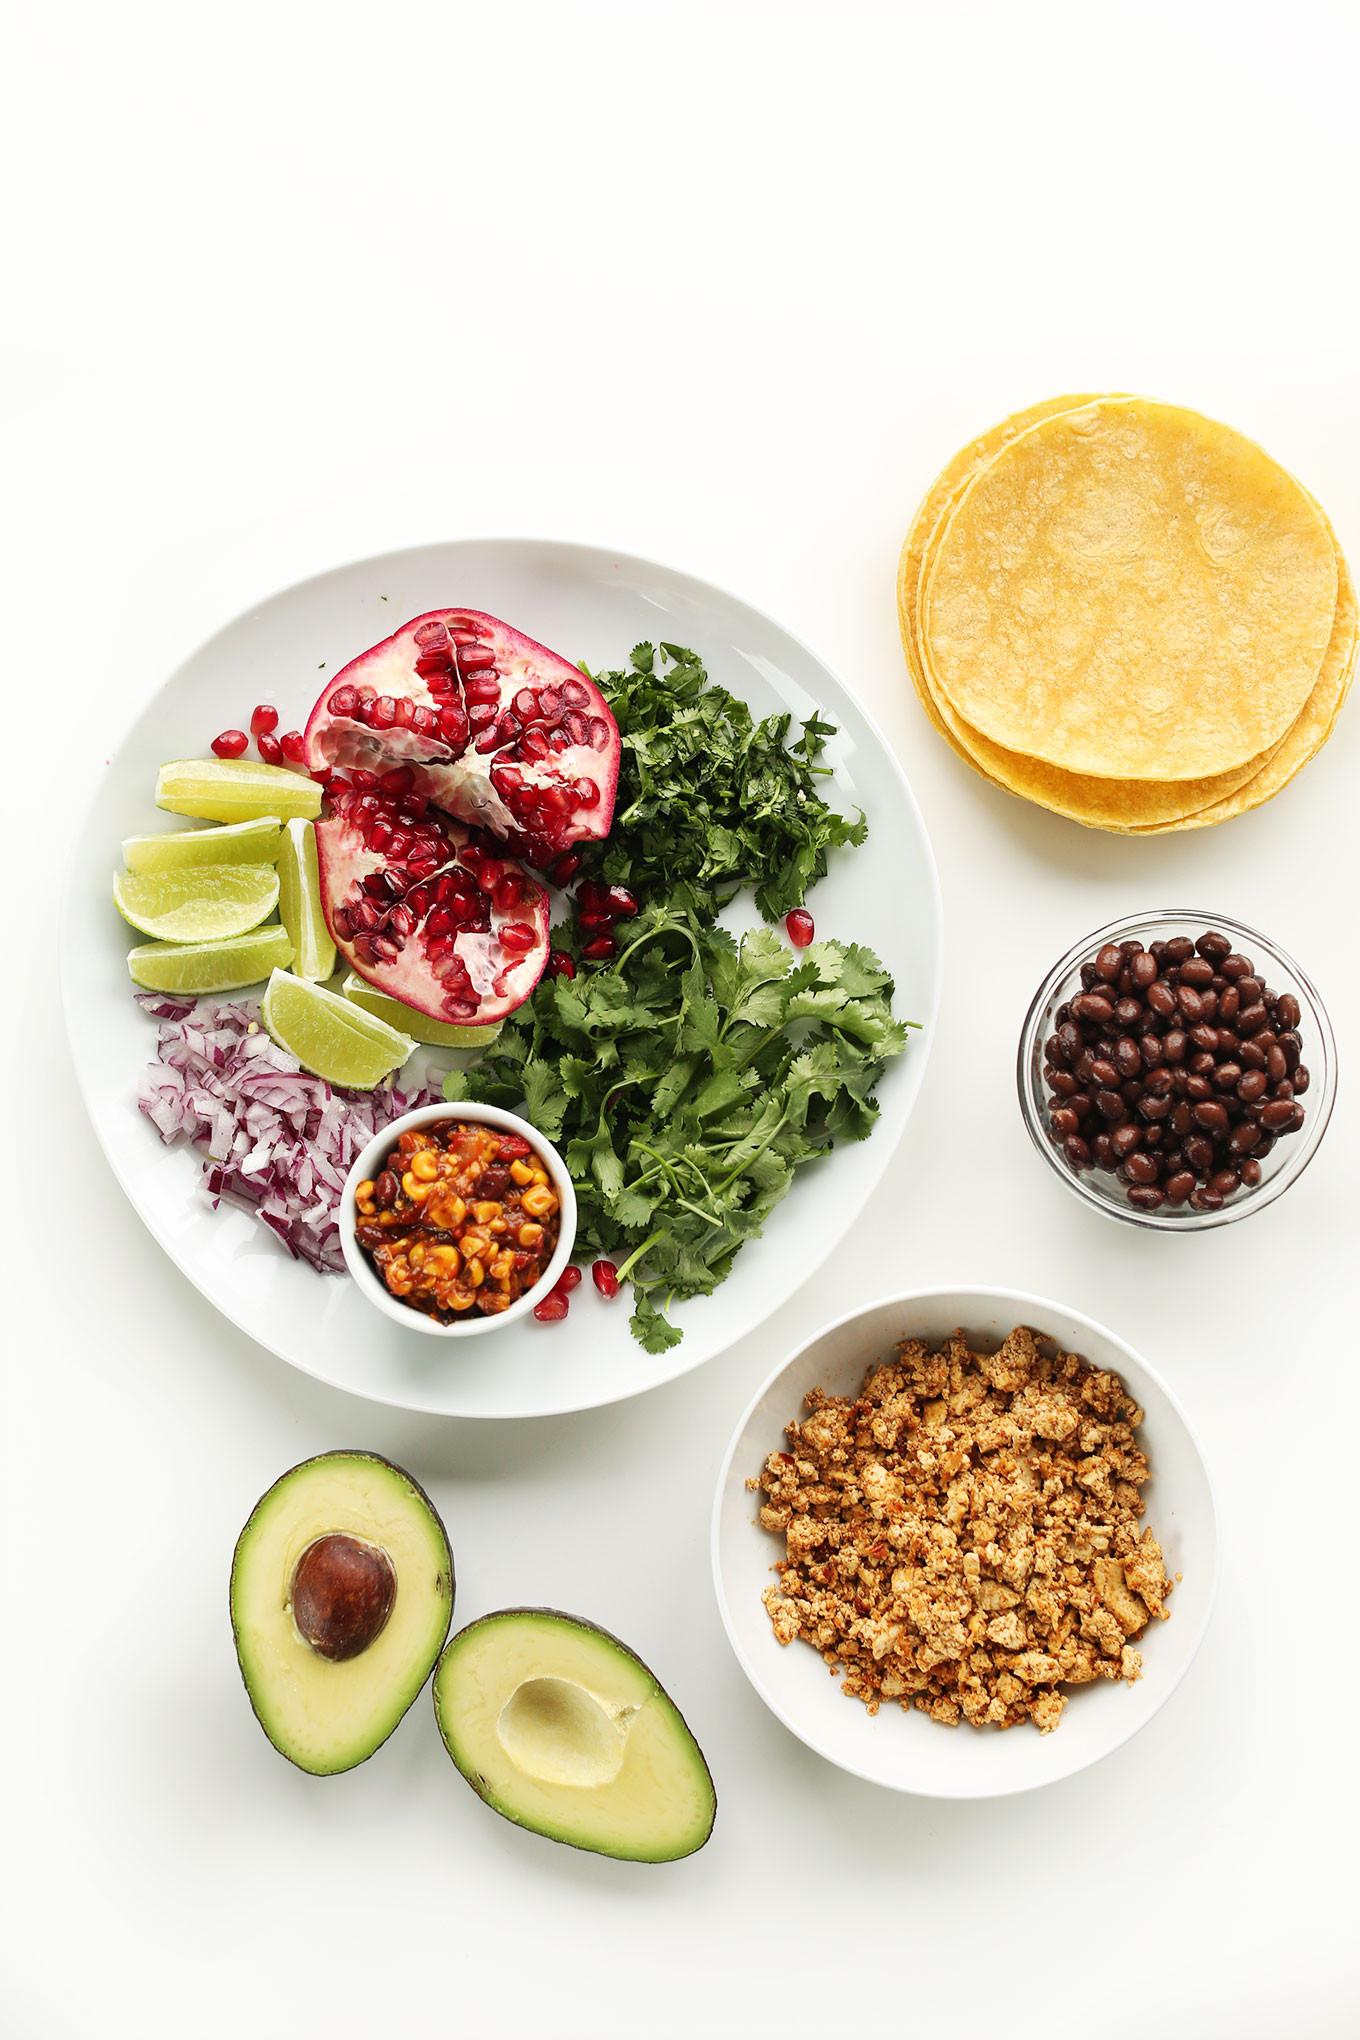 Healthy Vegan Breakfast  Meal Prep Recipes Breakfast Fit Foo Finds